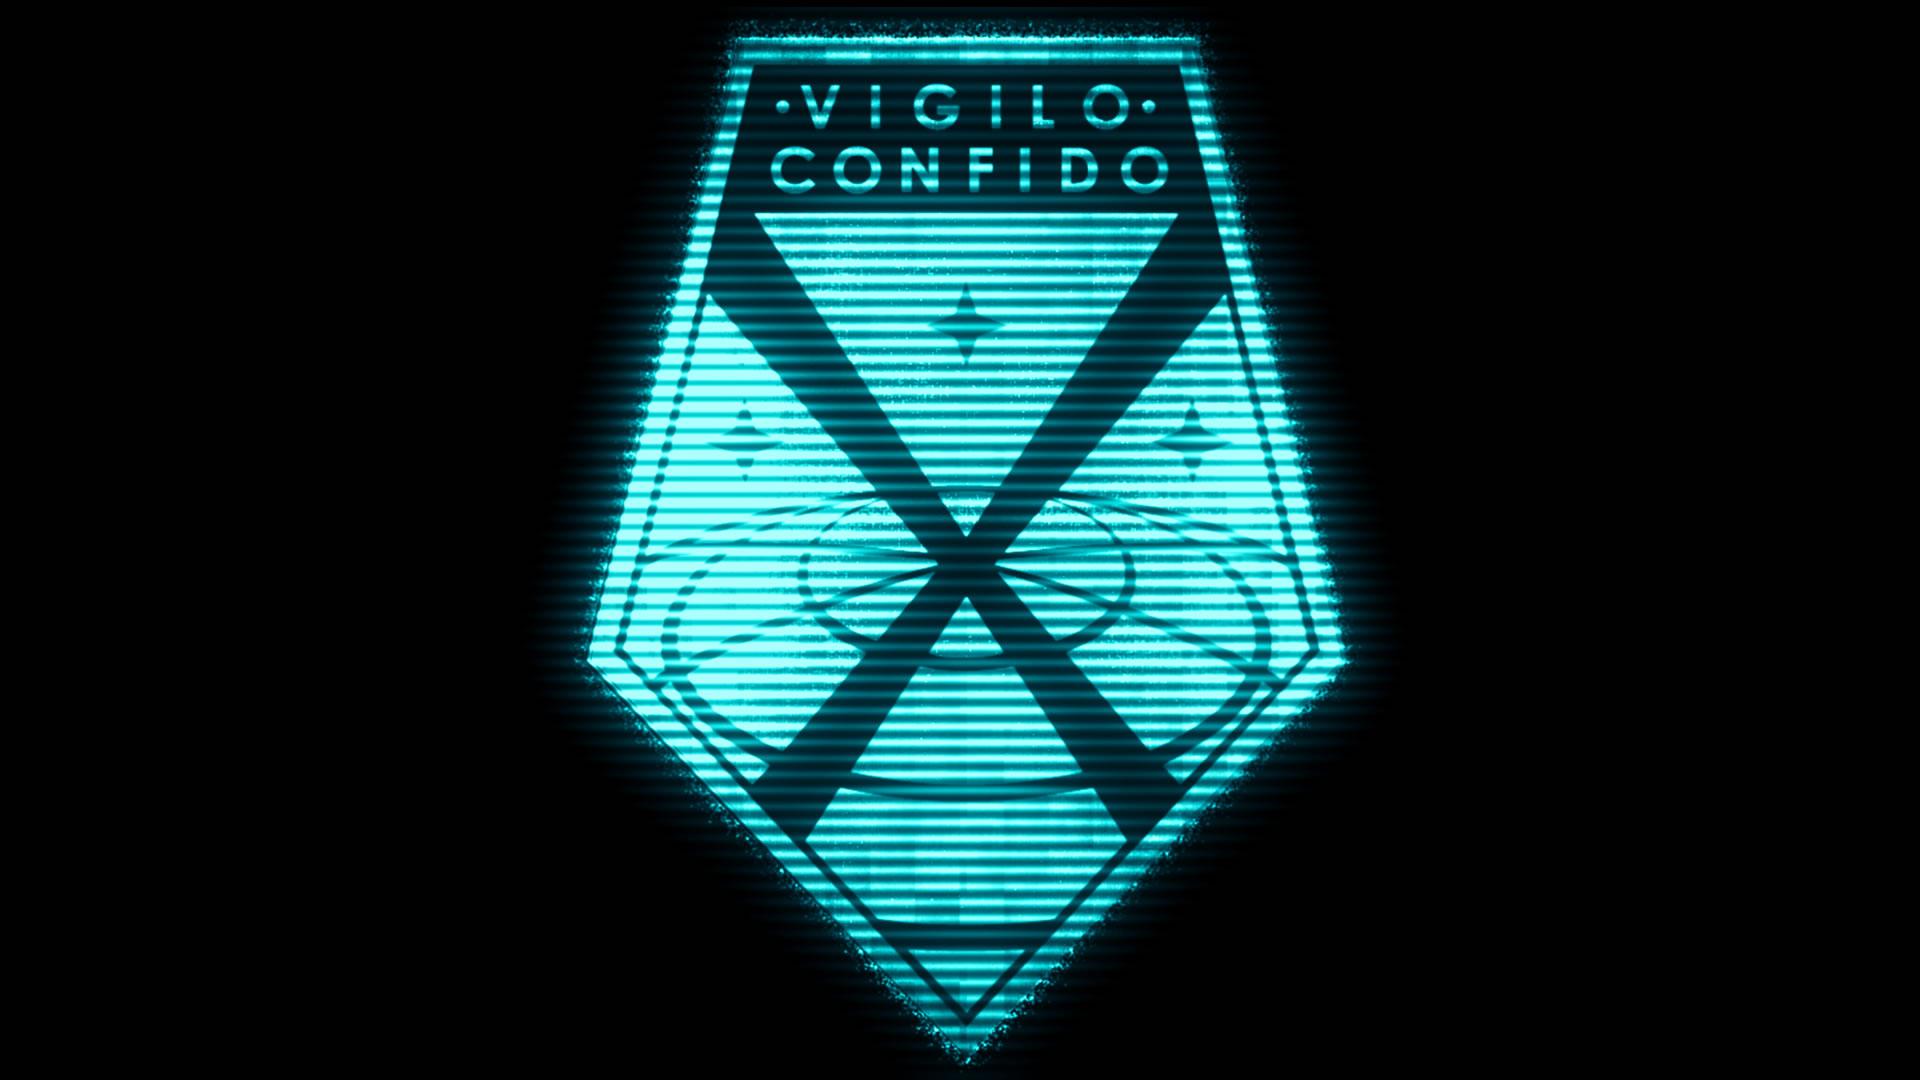 Обои | Фан-сайт игры XCOM: Enemy Unknown